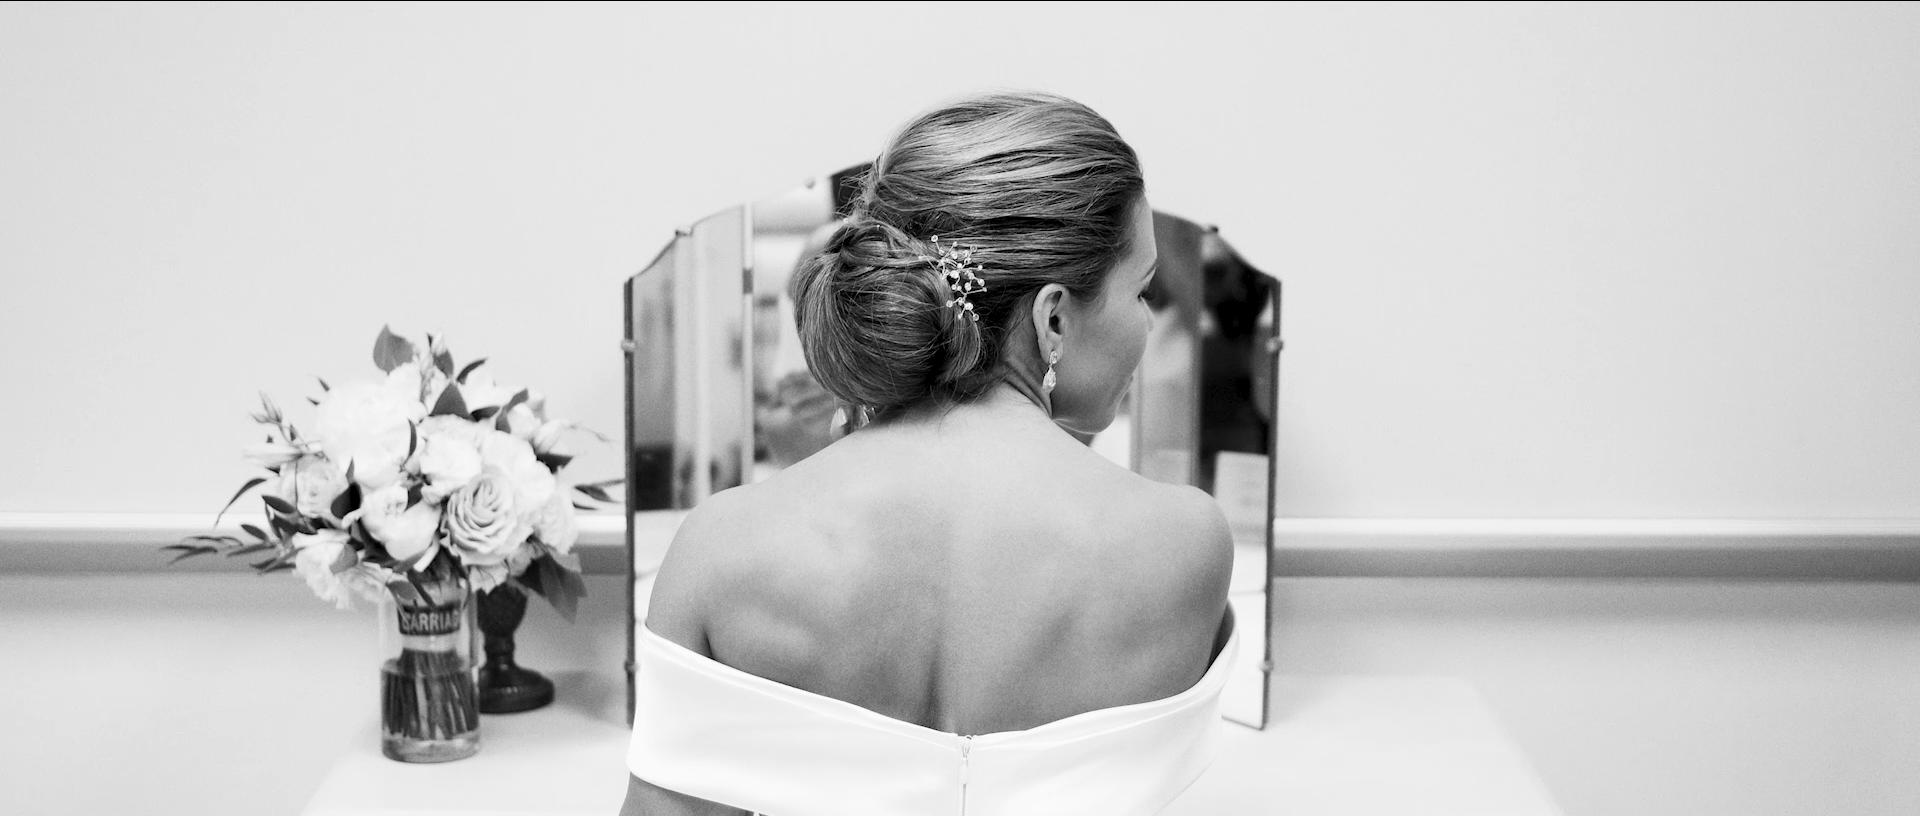 Lewis+Clark+College+Wedding+Videographer+Photographer_011.png